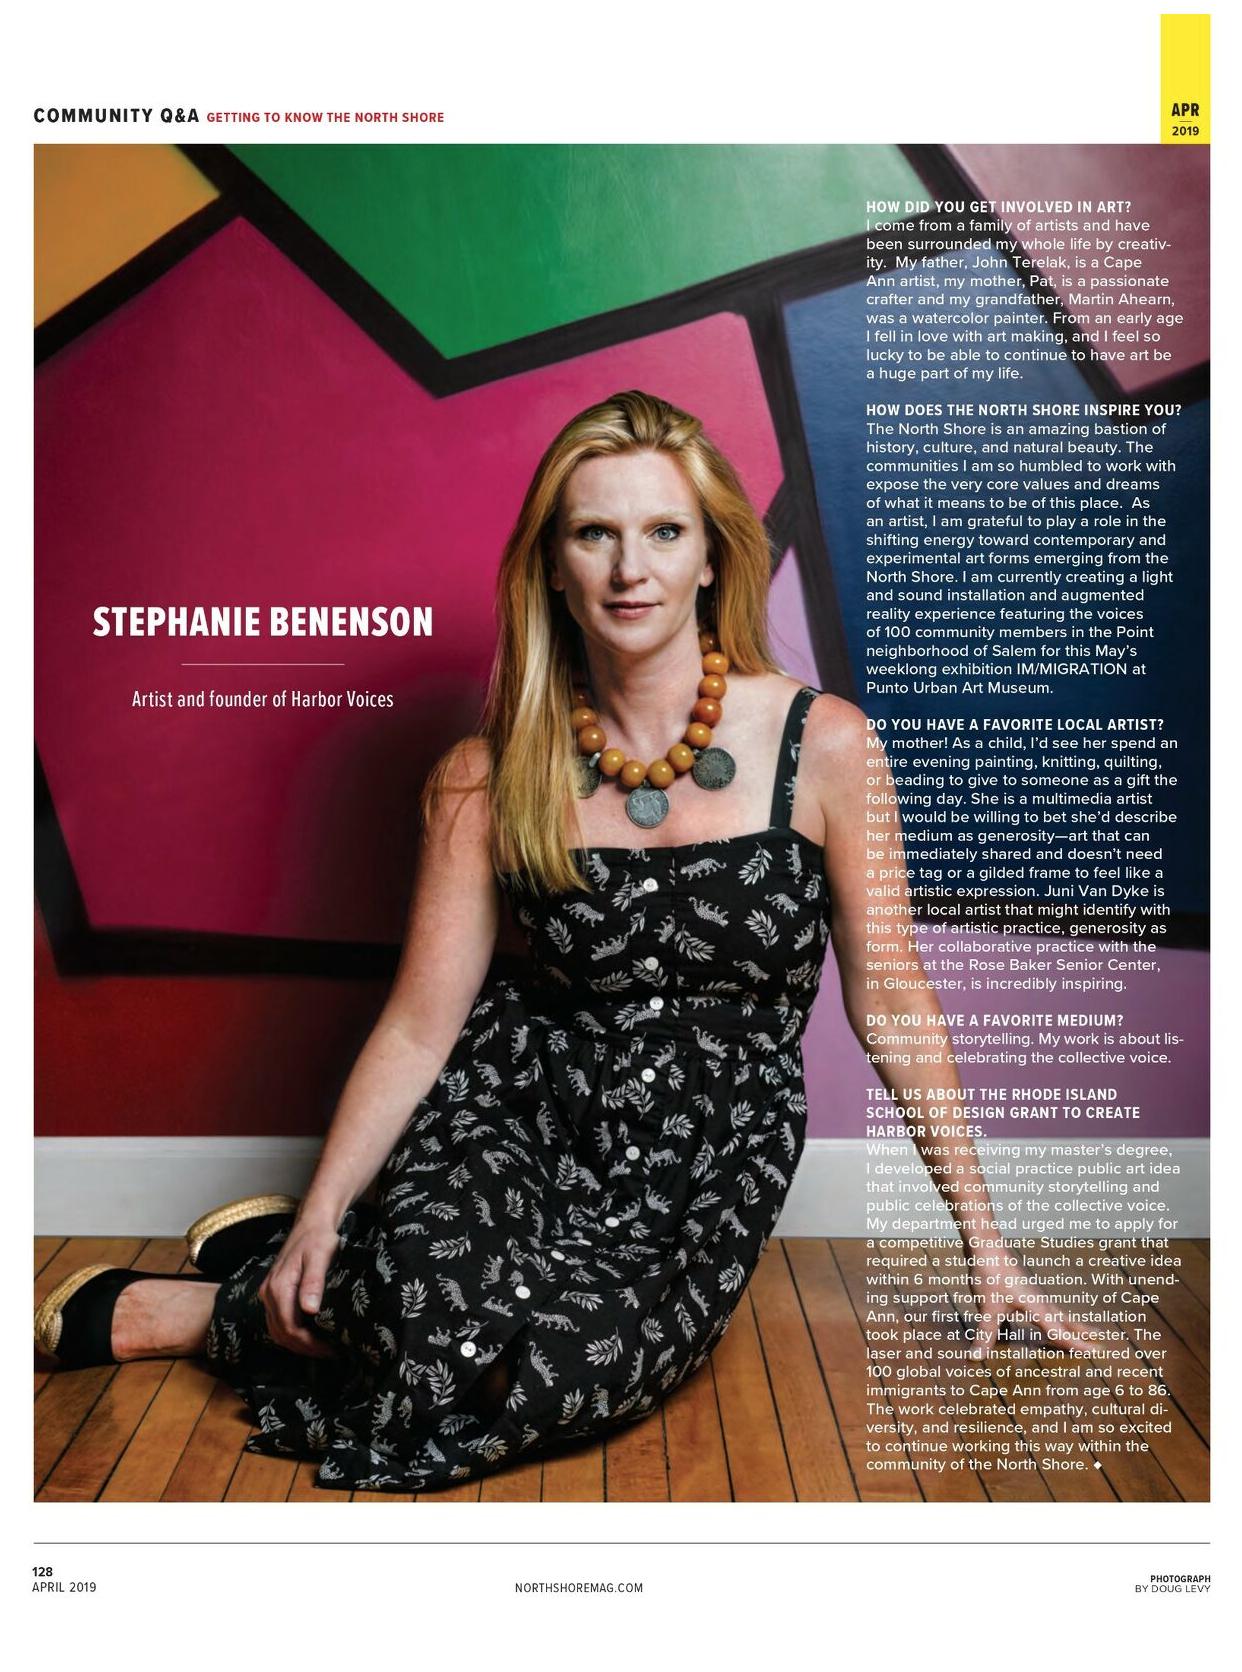 Stephanie Benenson, Northshore Magazine